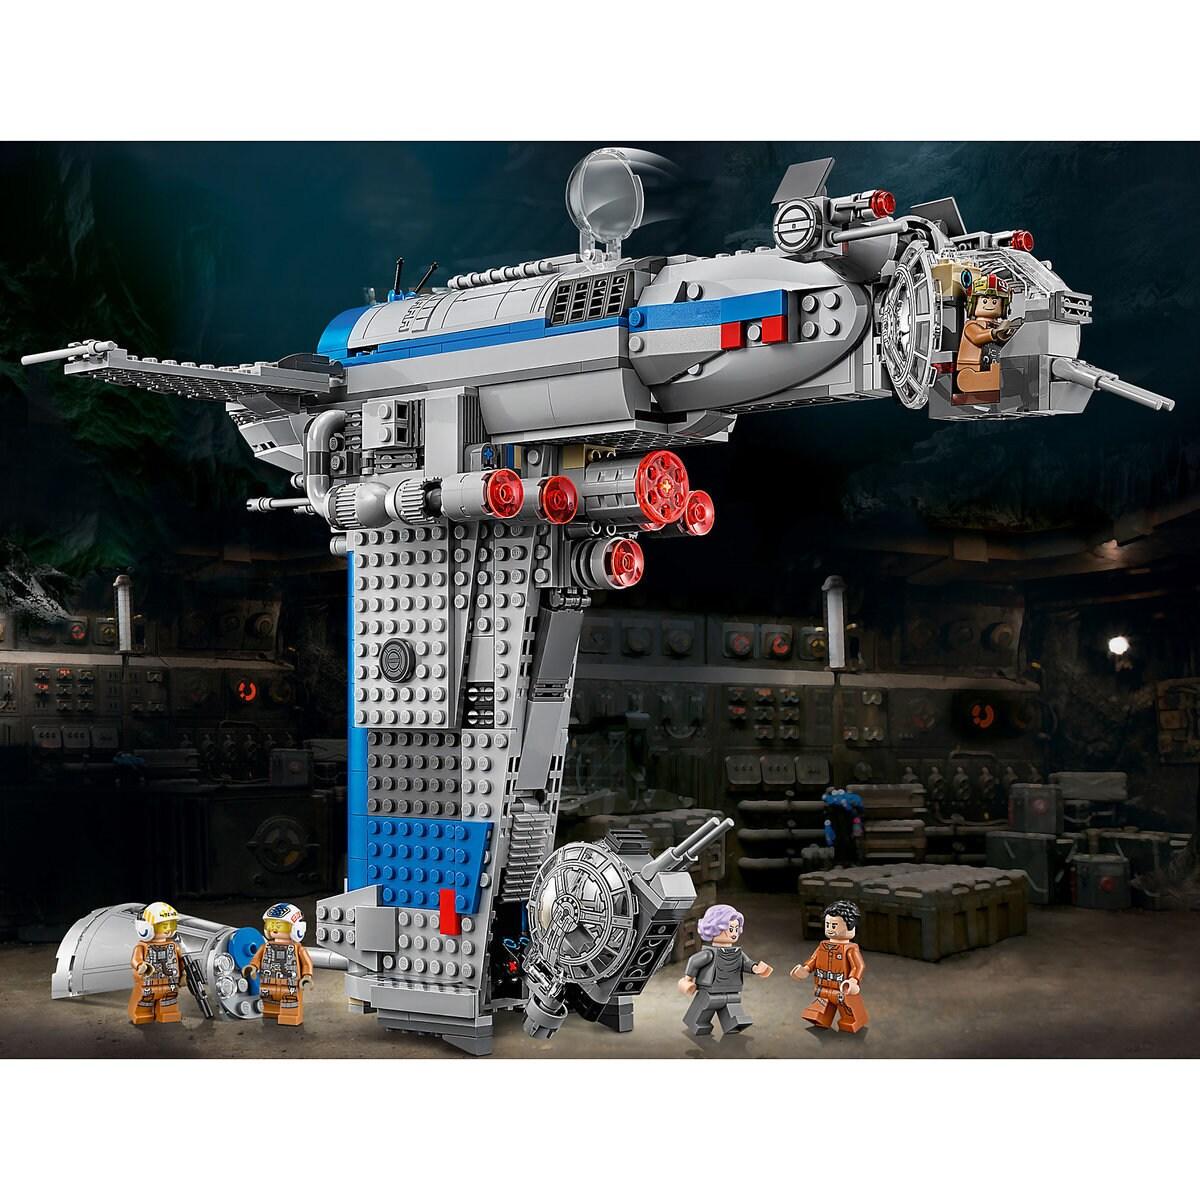 Last Bomber Jedi By Lego WarsThe Star Resistance y0nPvNOw8m